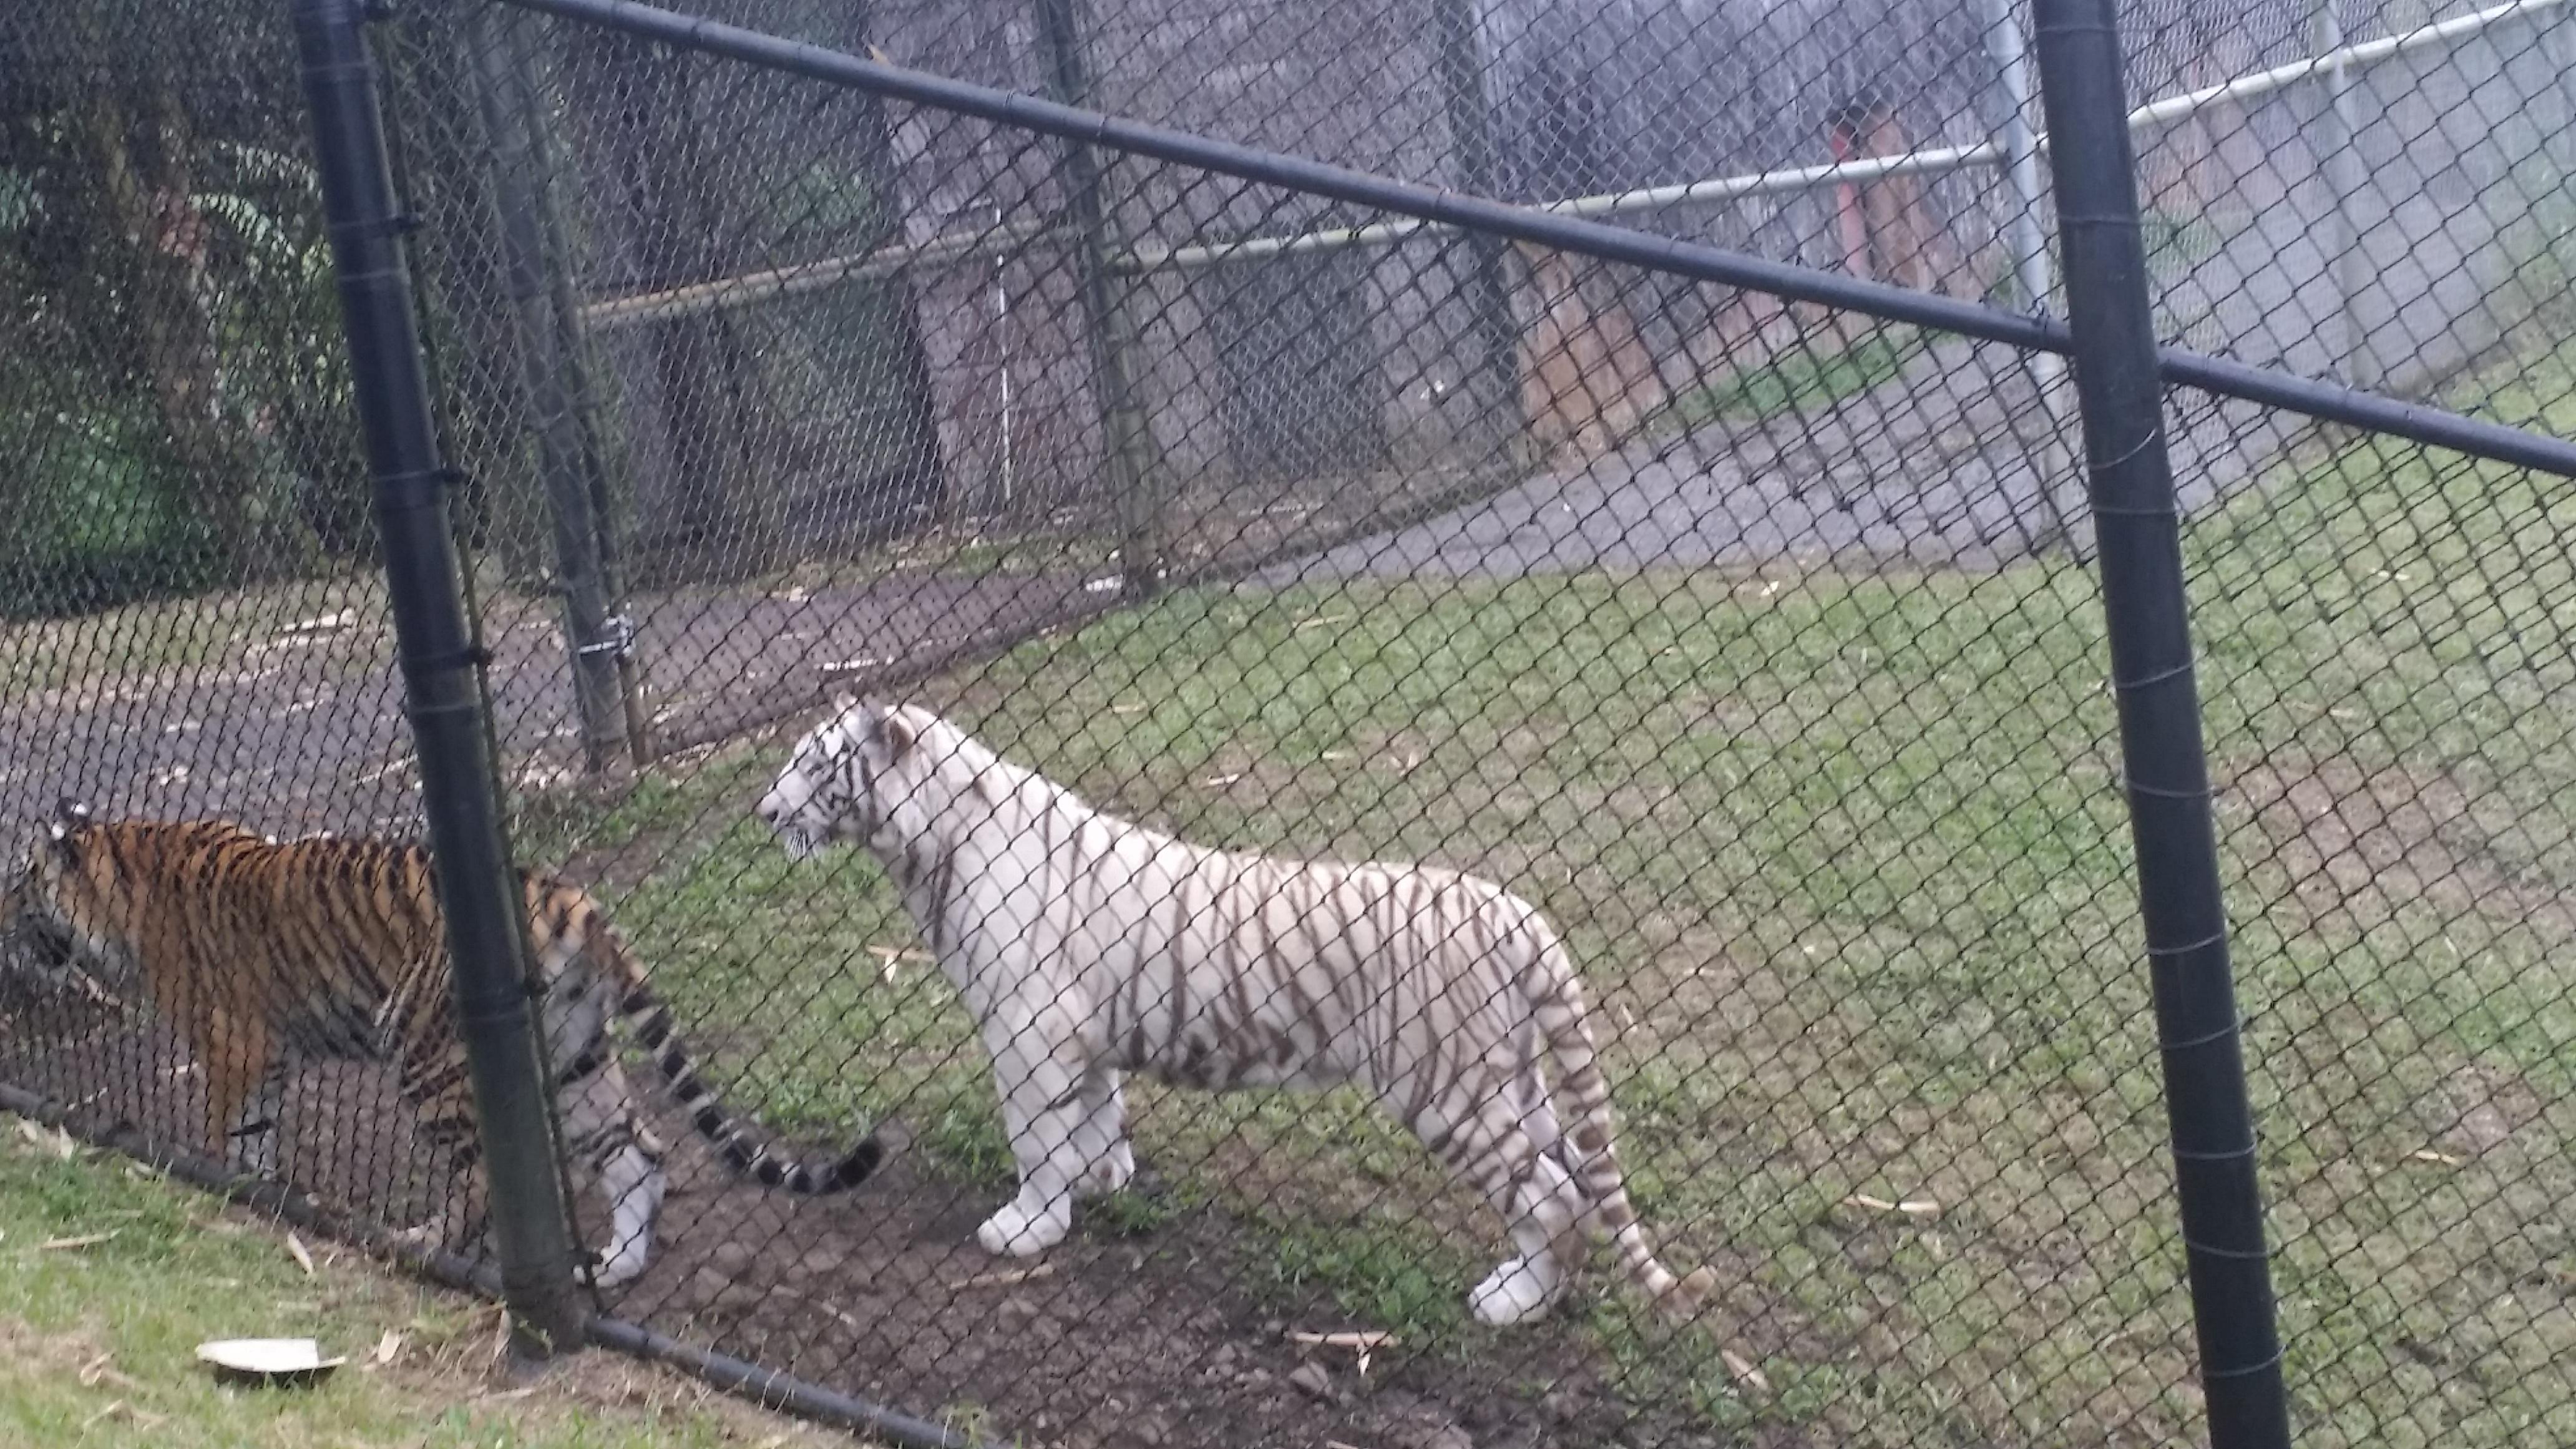 Rainforest zoo, Hilo